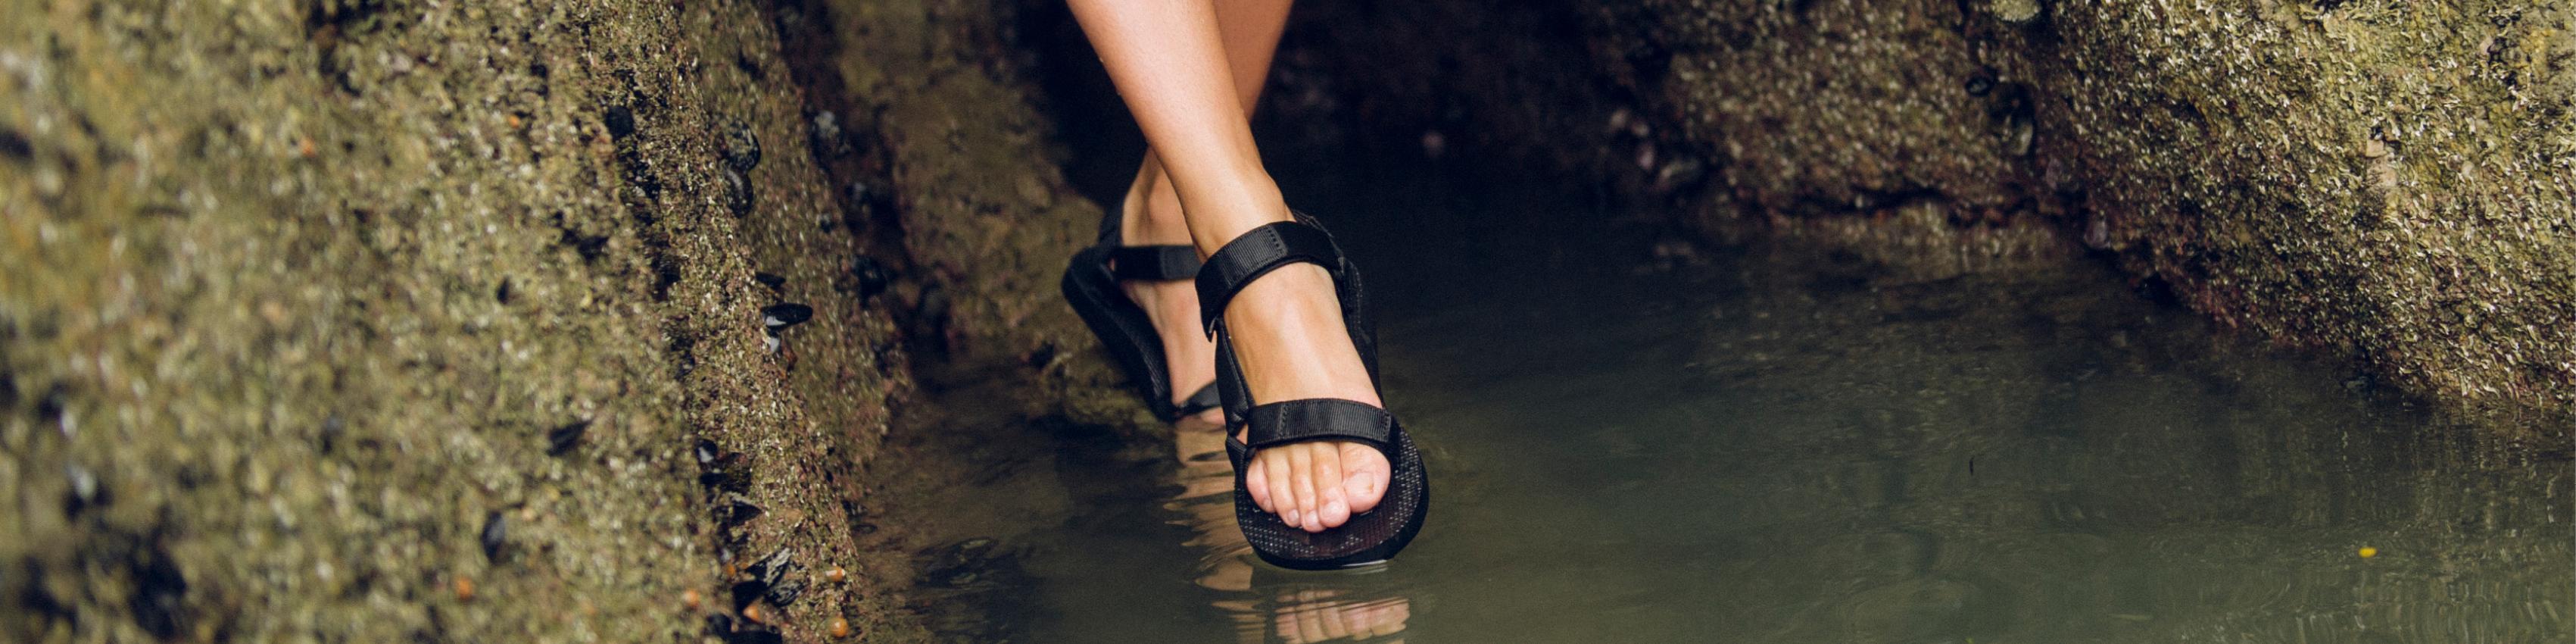 Teva Women's Original Sandals